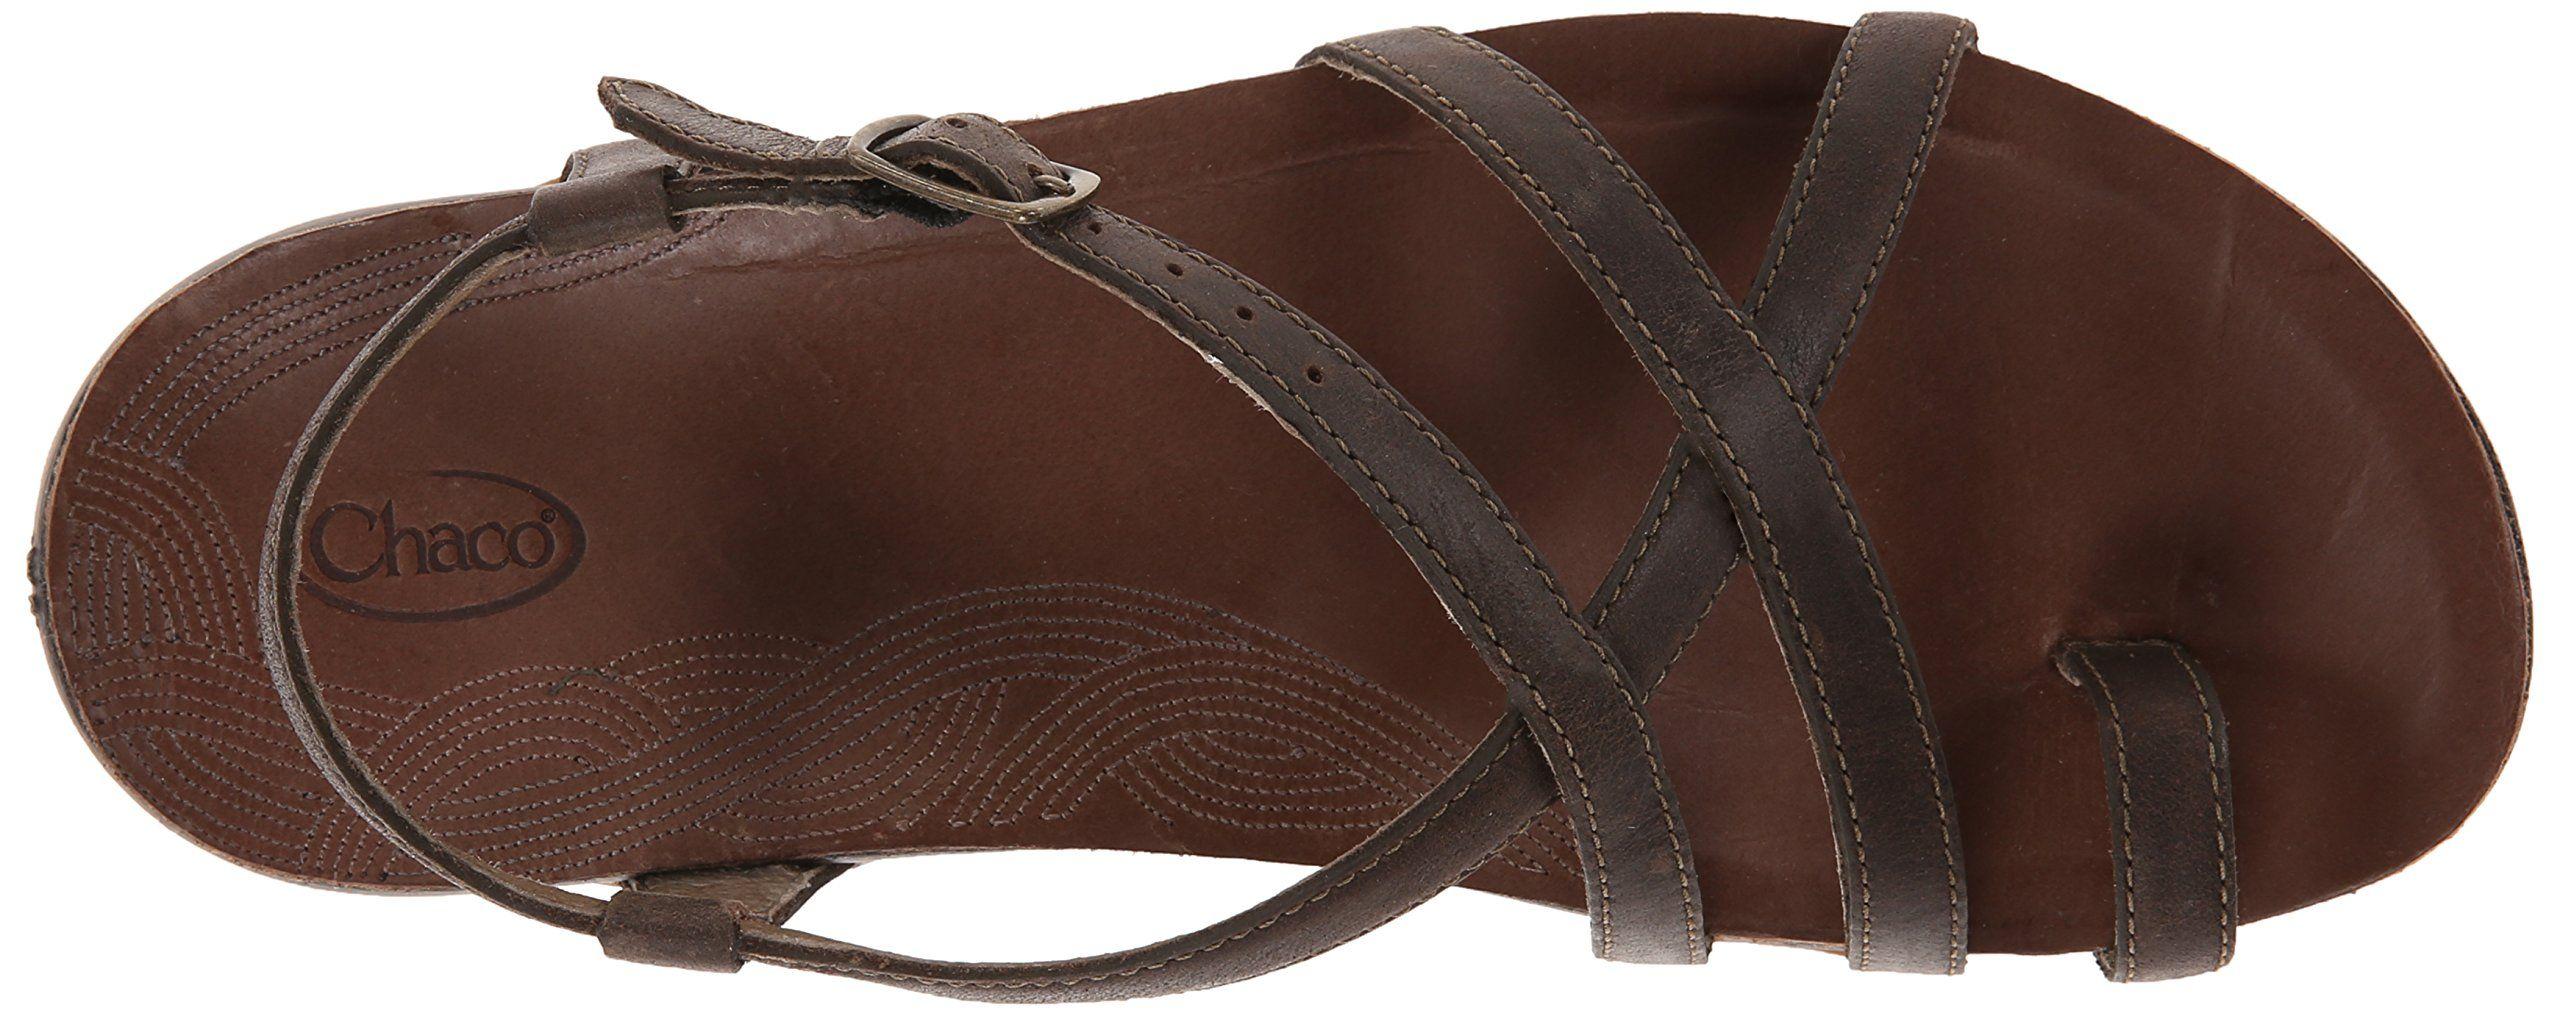 Amazon.com: Chaco Women's Dorra Sandal: Shoes